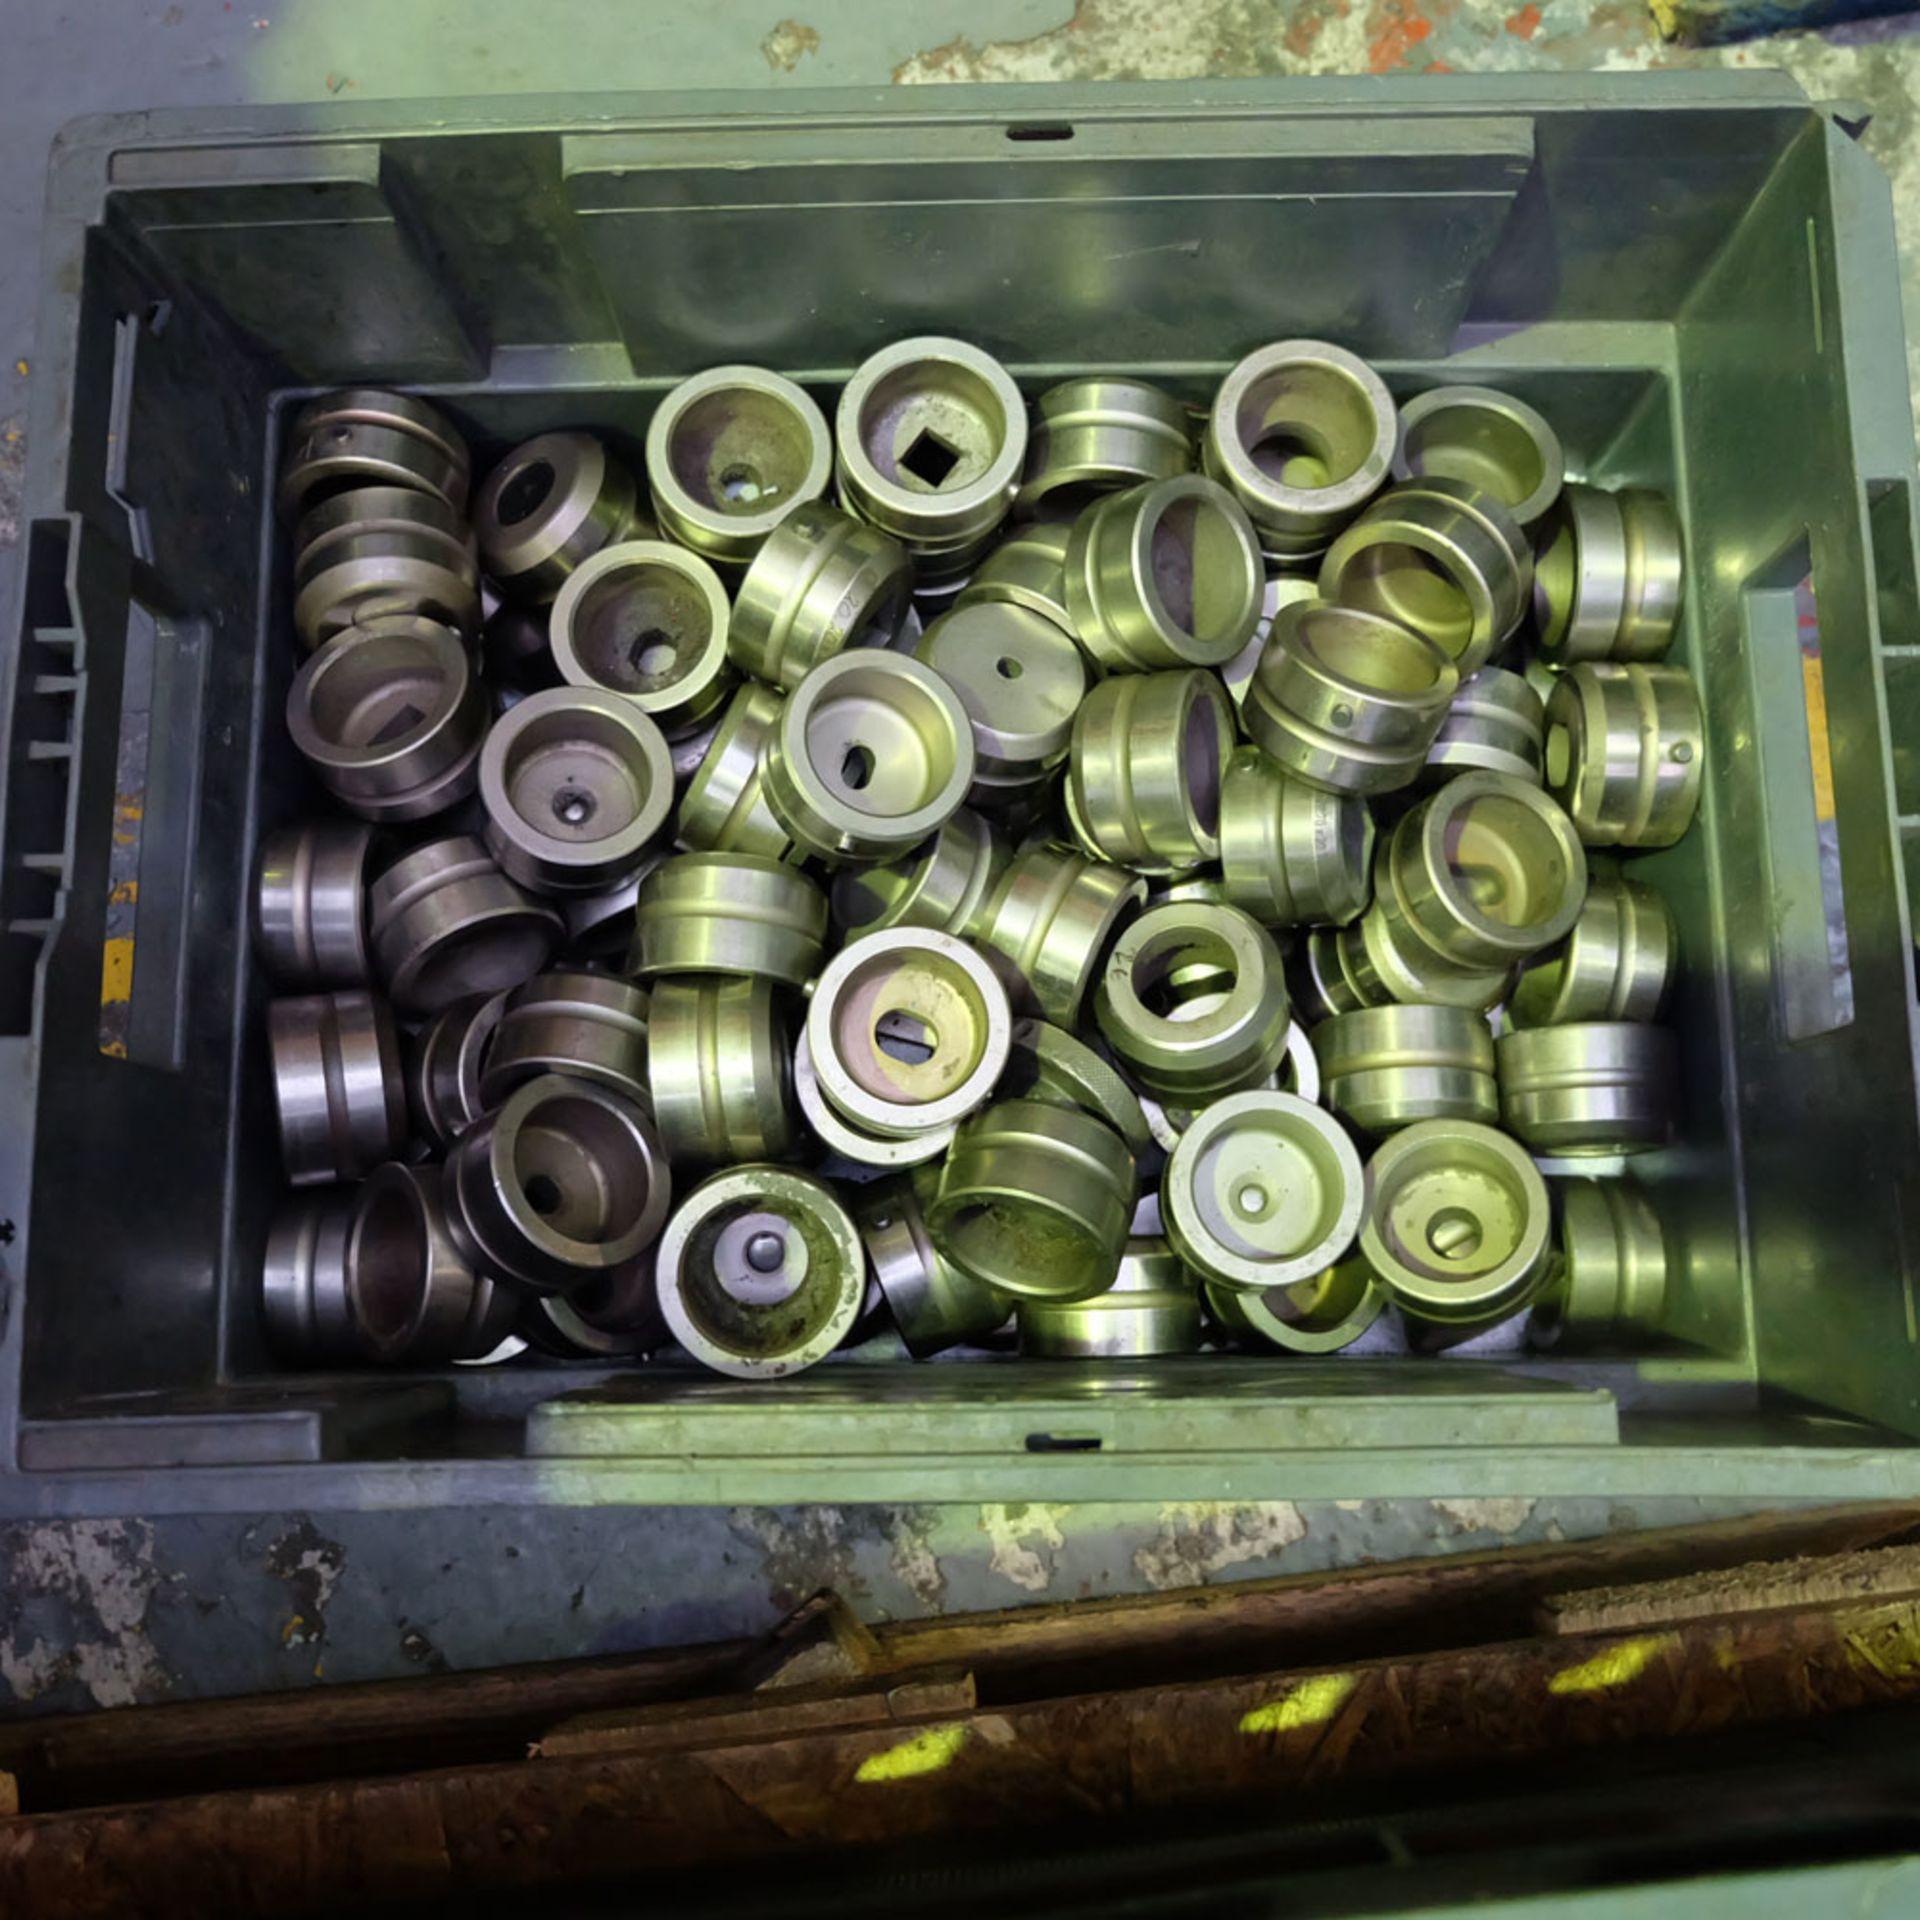 Amada D-750 Duplicator Punching Machine. - Image 18 of 18